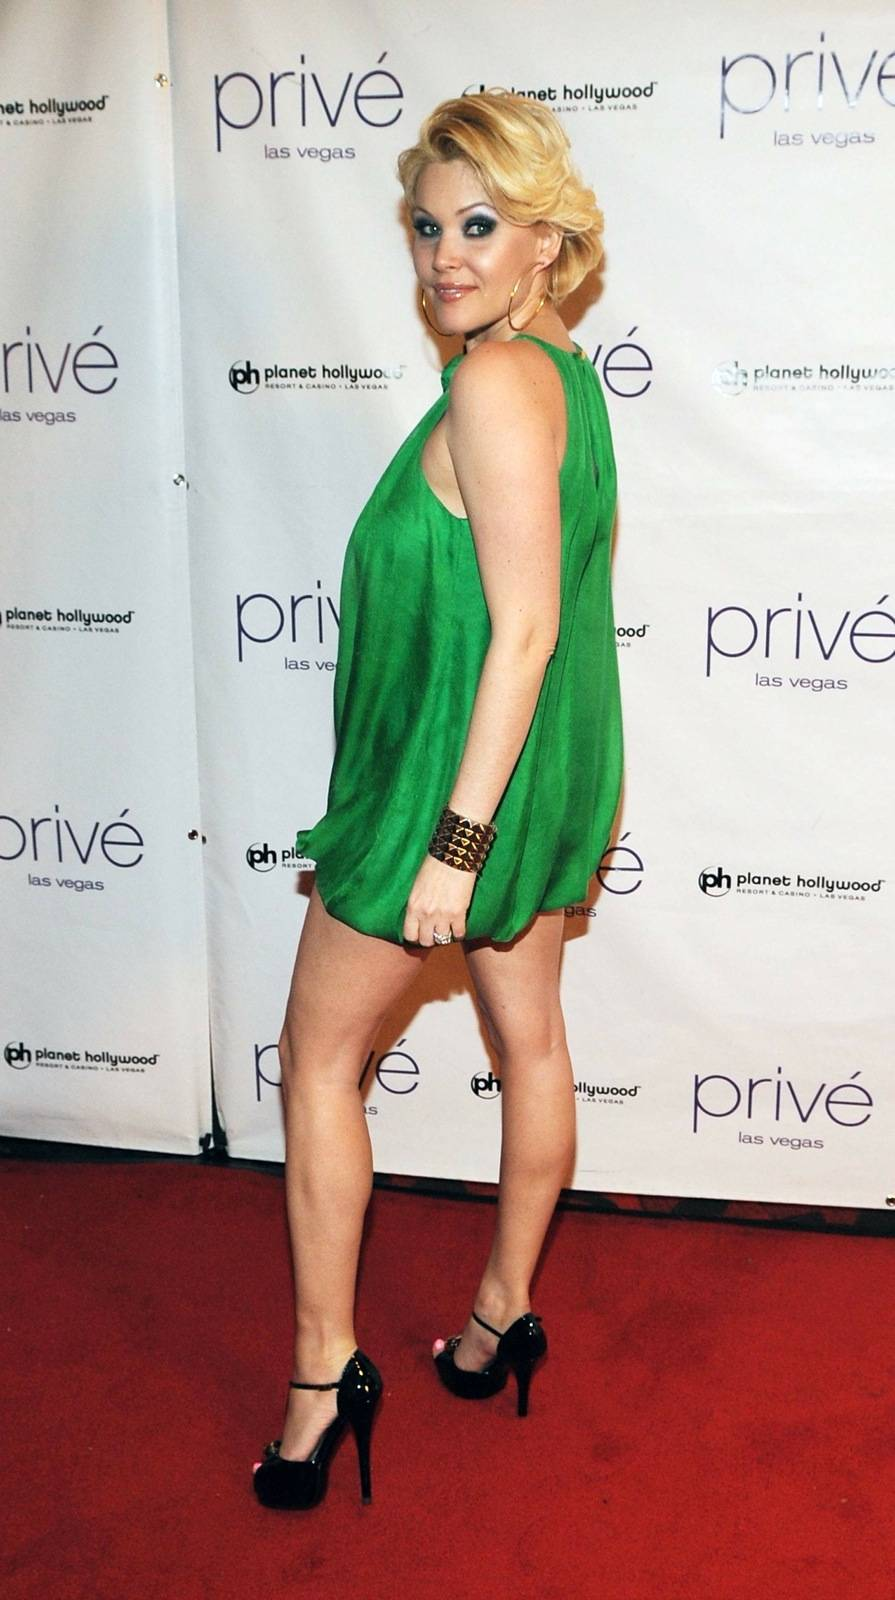 Shanna Moakler Prive Las Vegas Weekly